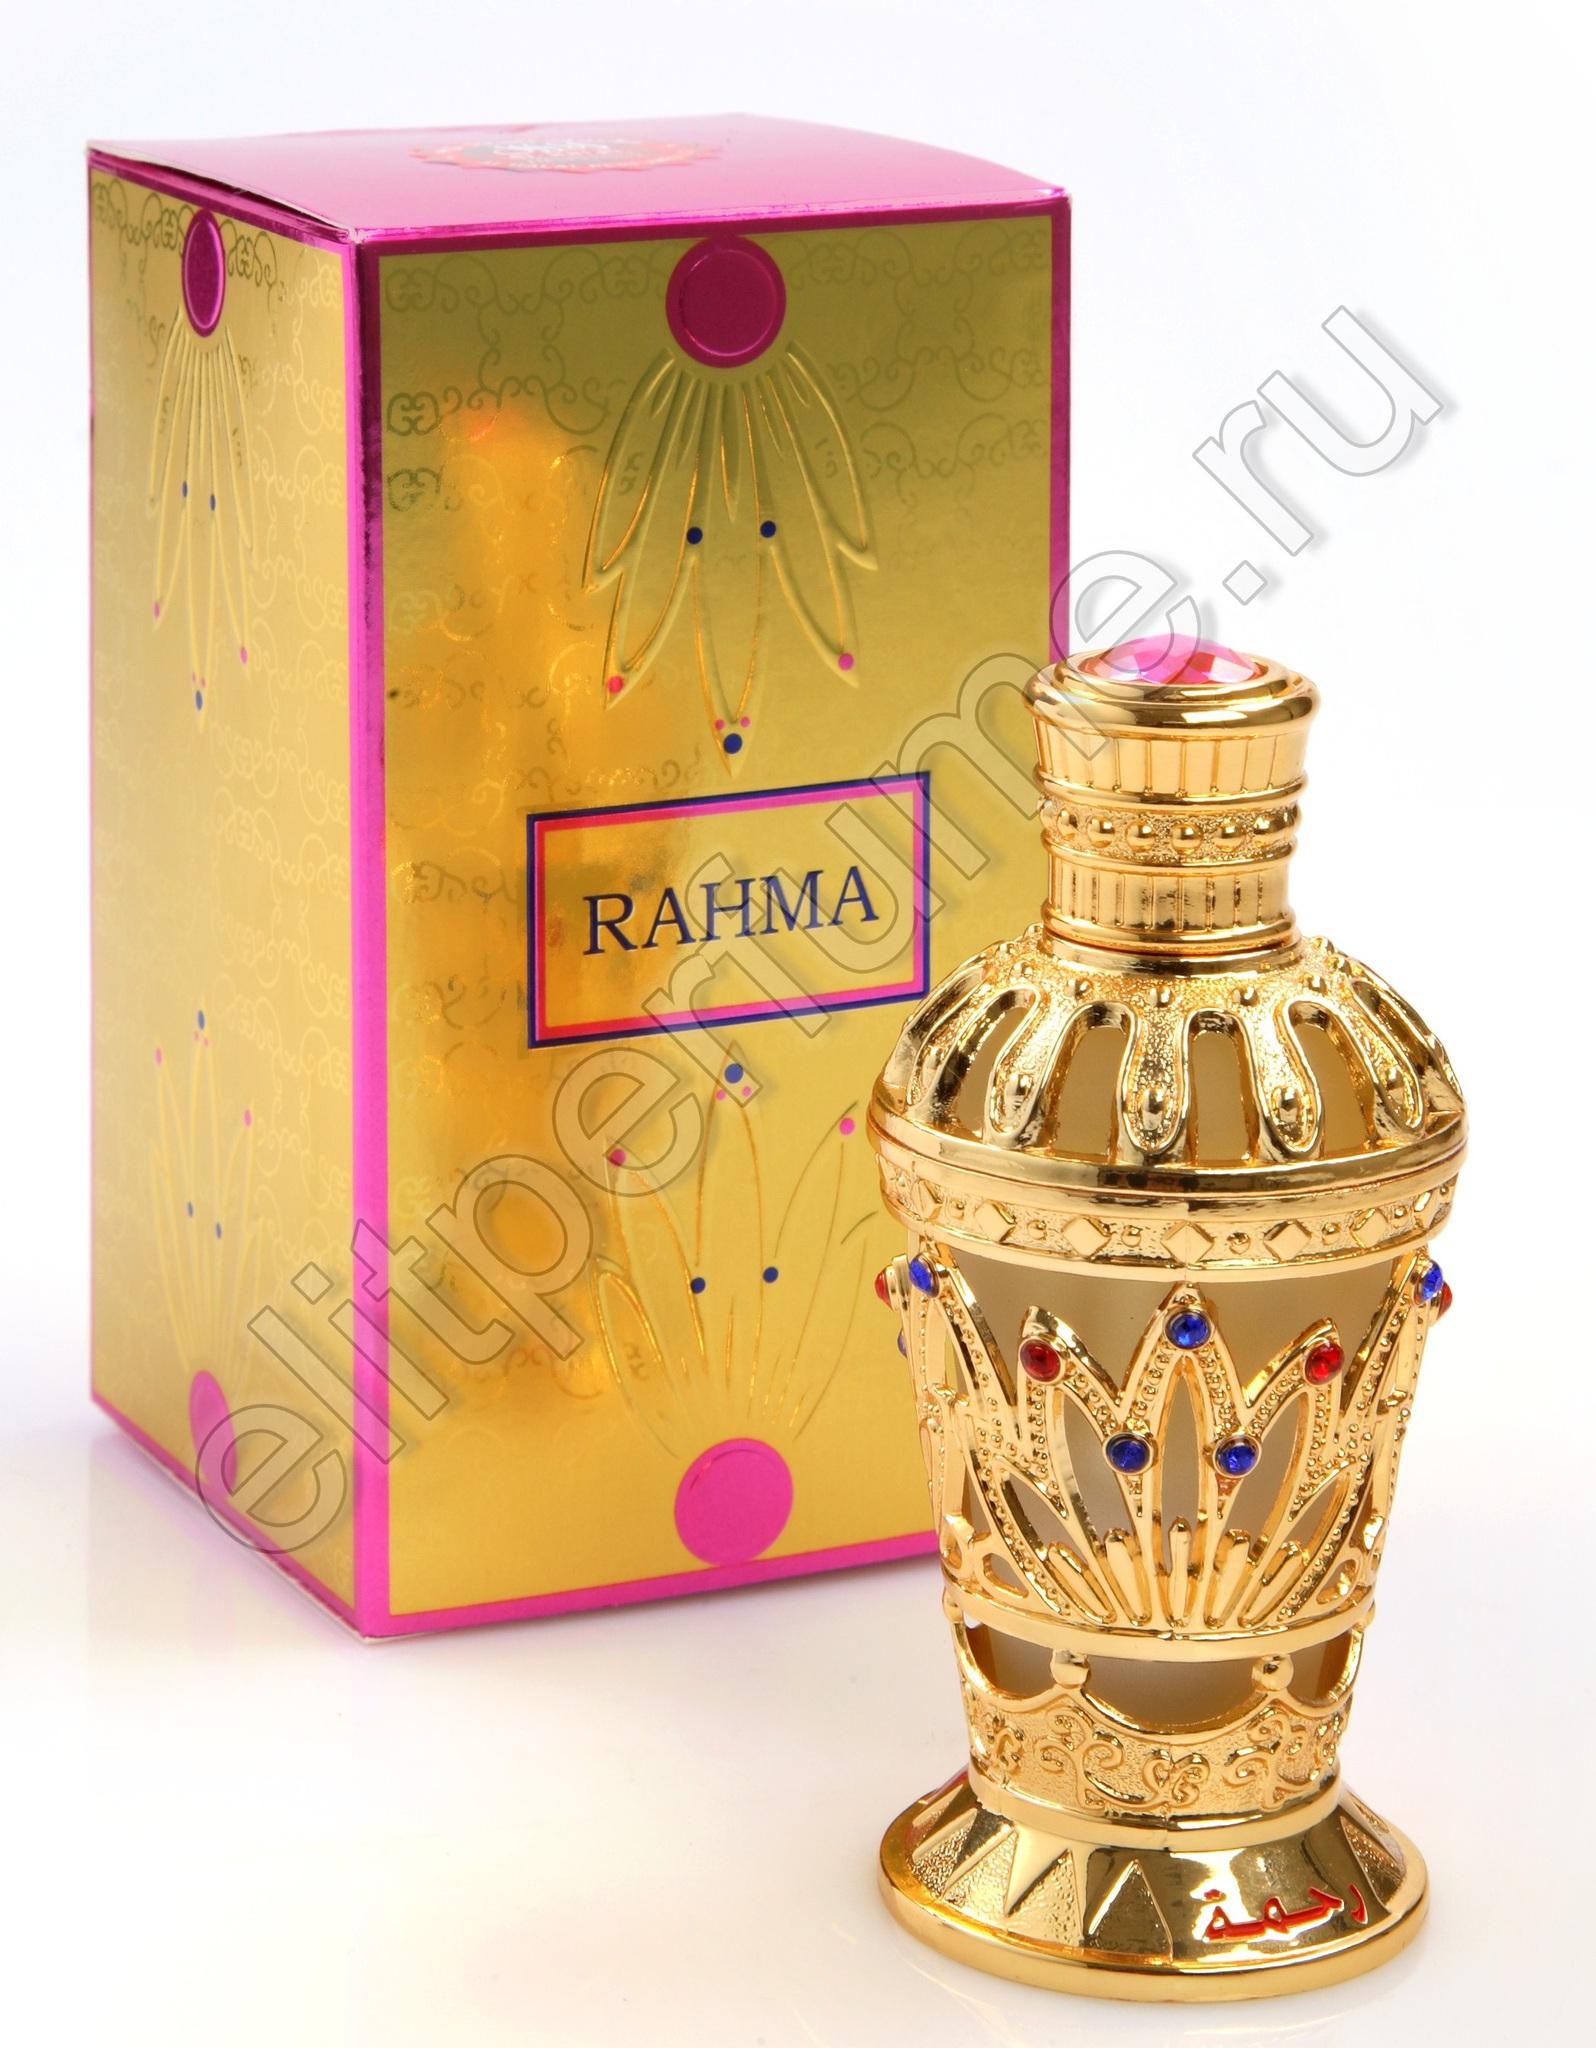 Пробники для духов Рама Rahma 1 мл арабские масляные духи от Аль Харамайн Al Haramin Perfumes